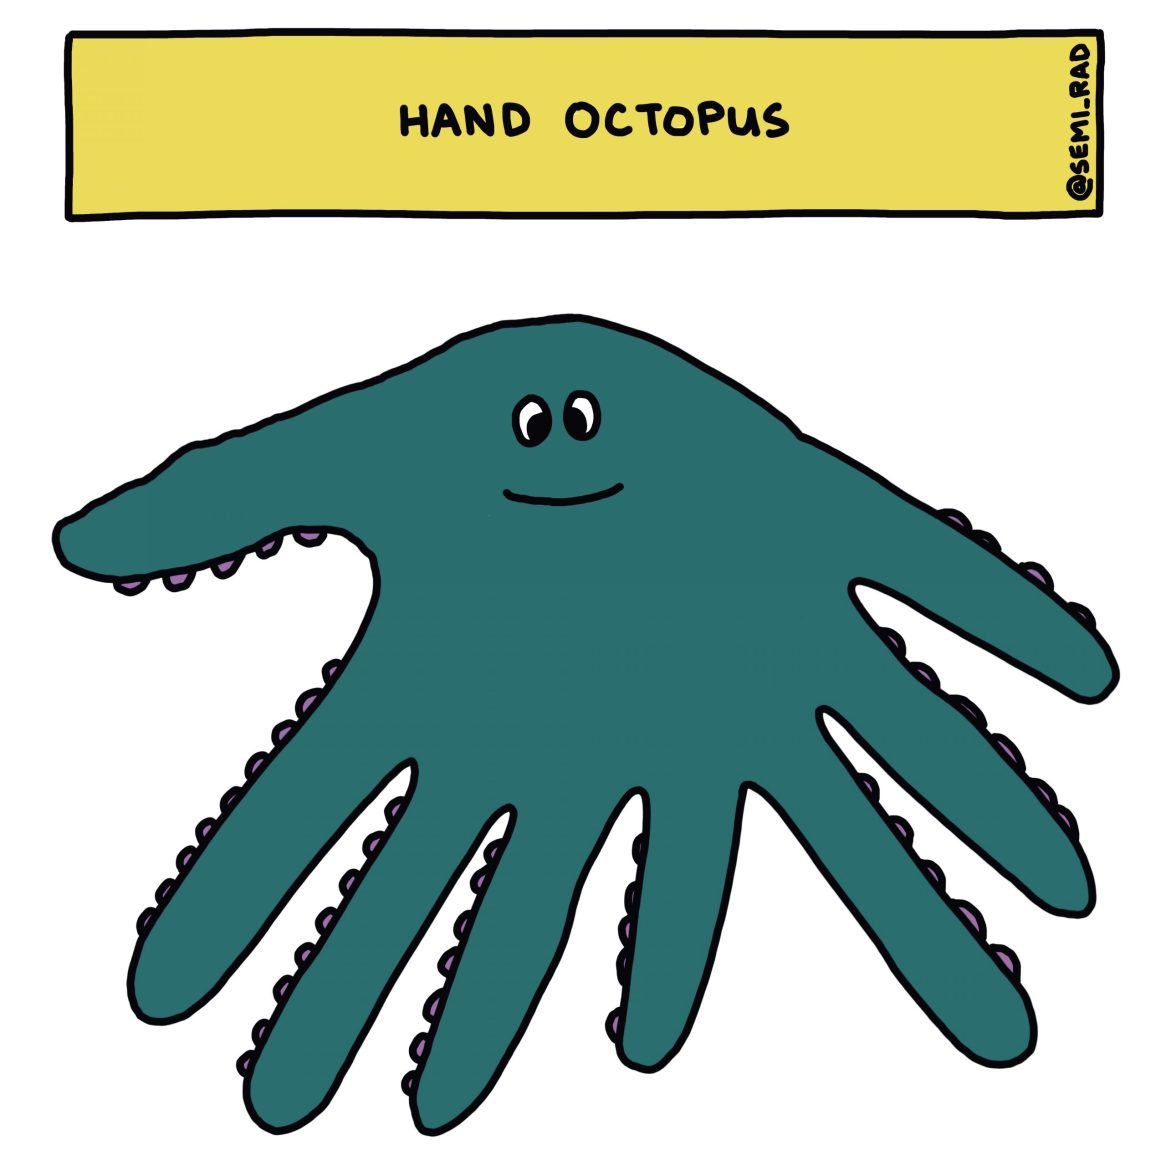 semi-rad hand octopus